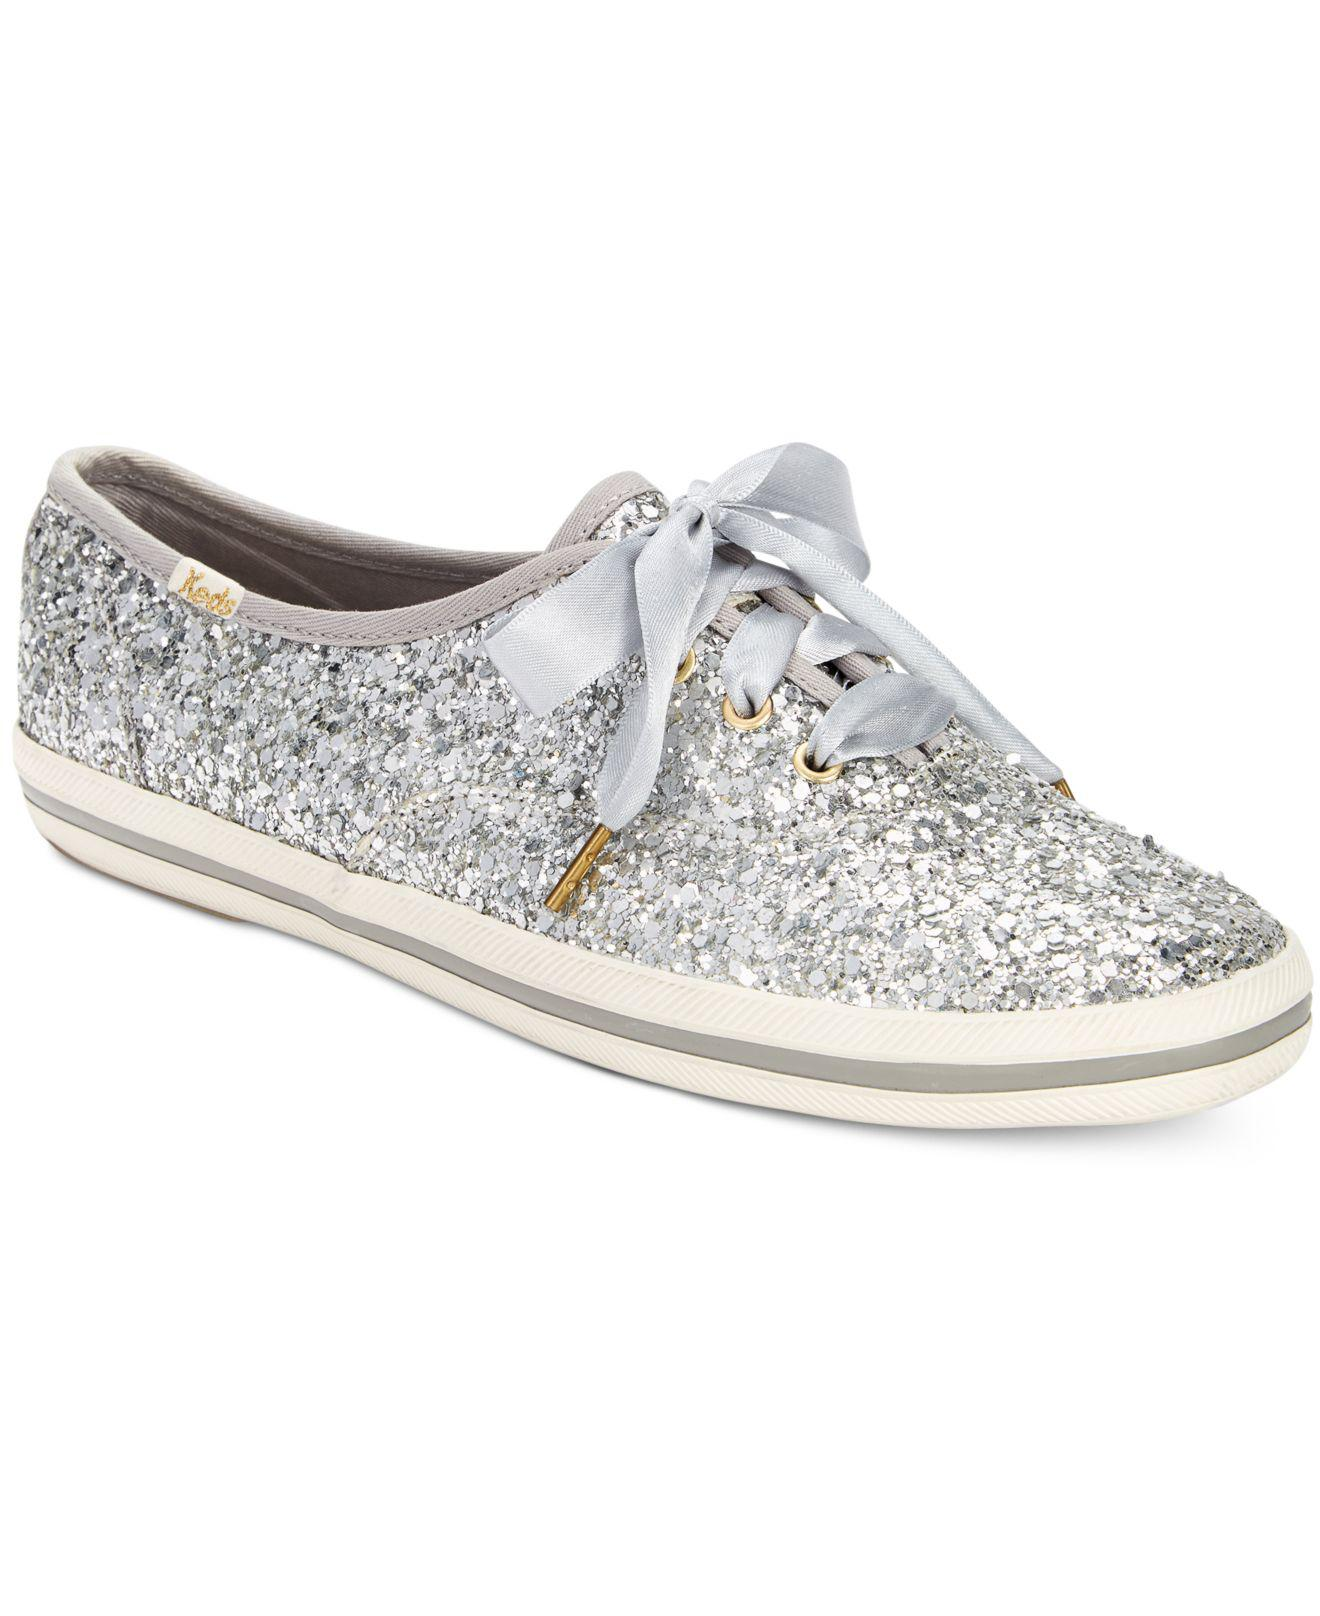 f10886b45b46 Lyst - Kate Spade Glitter Lace-up Sneakers in Metallic